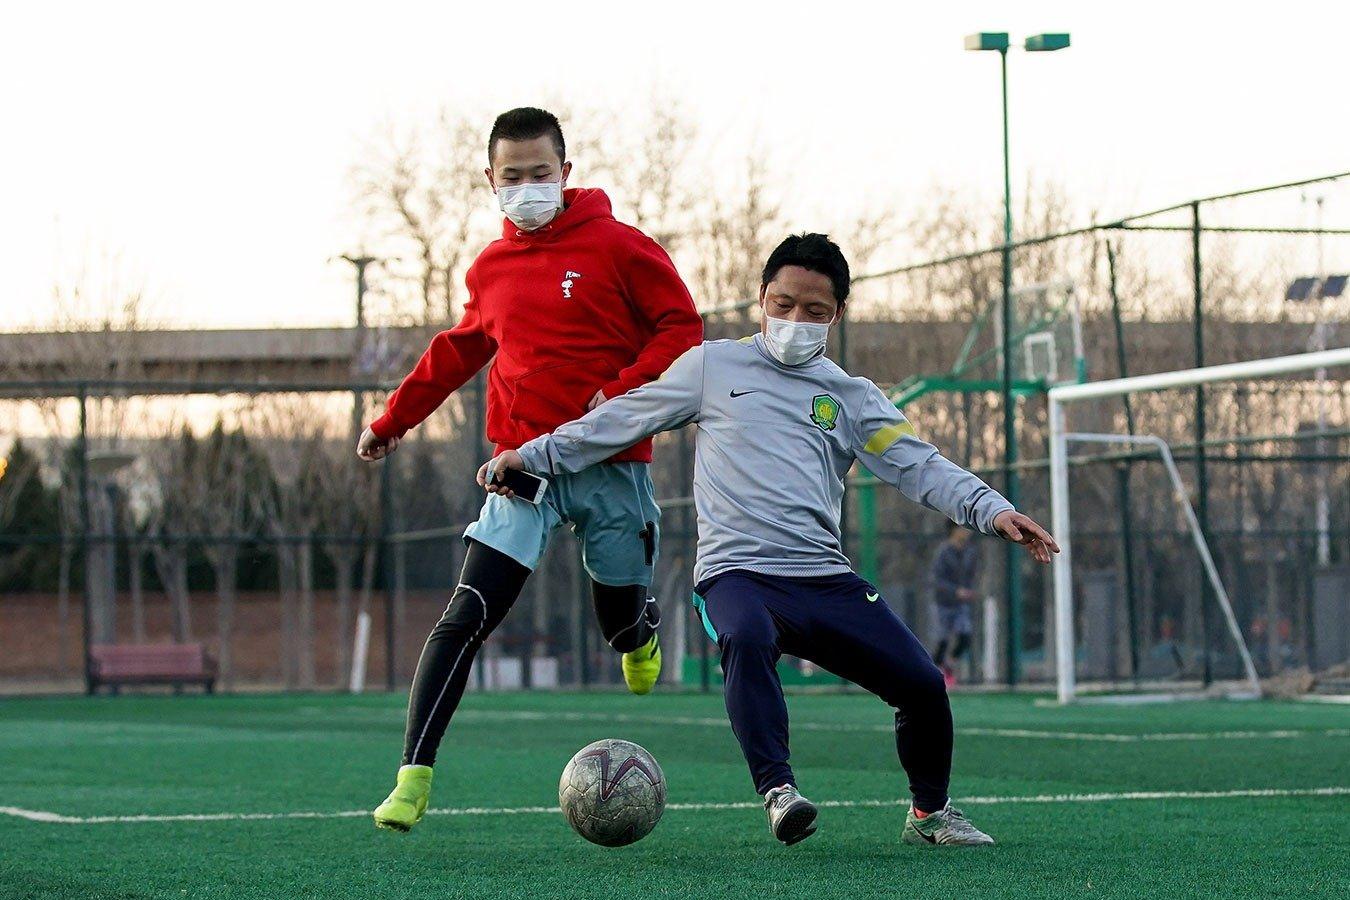 TOP 5 futbolnyh komand kotorym navredil koronavirus